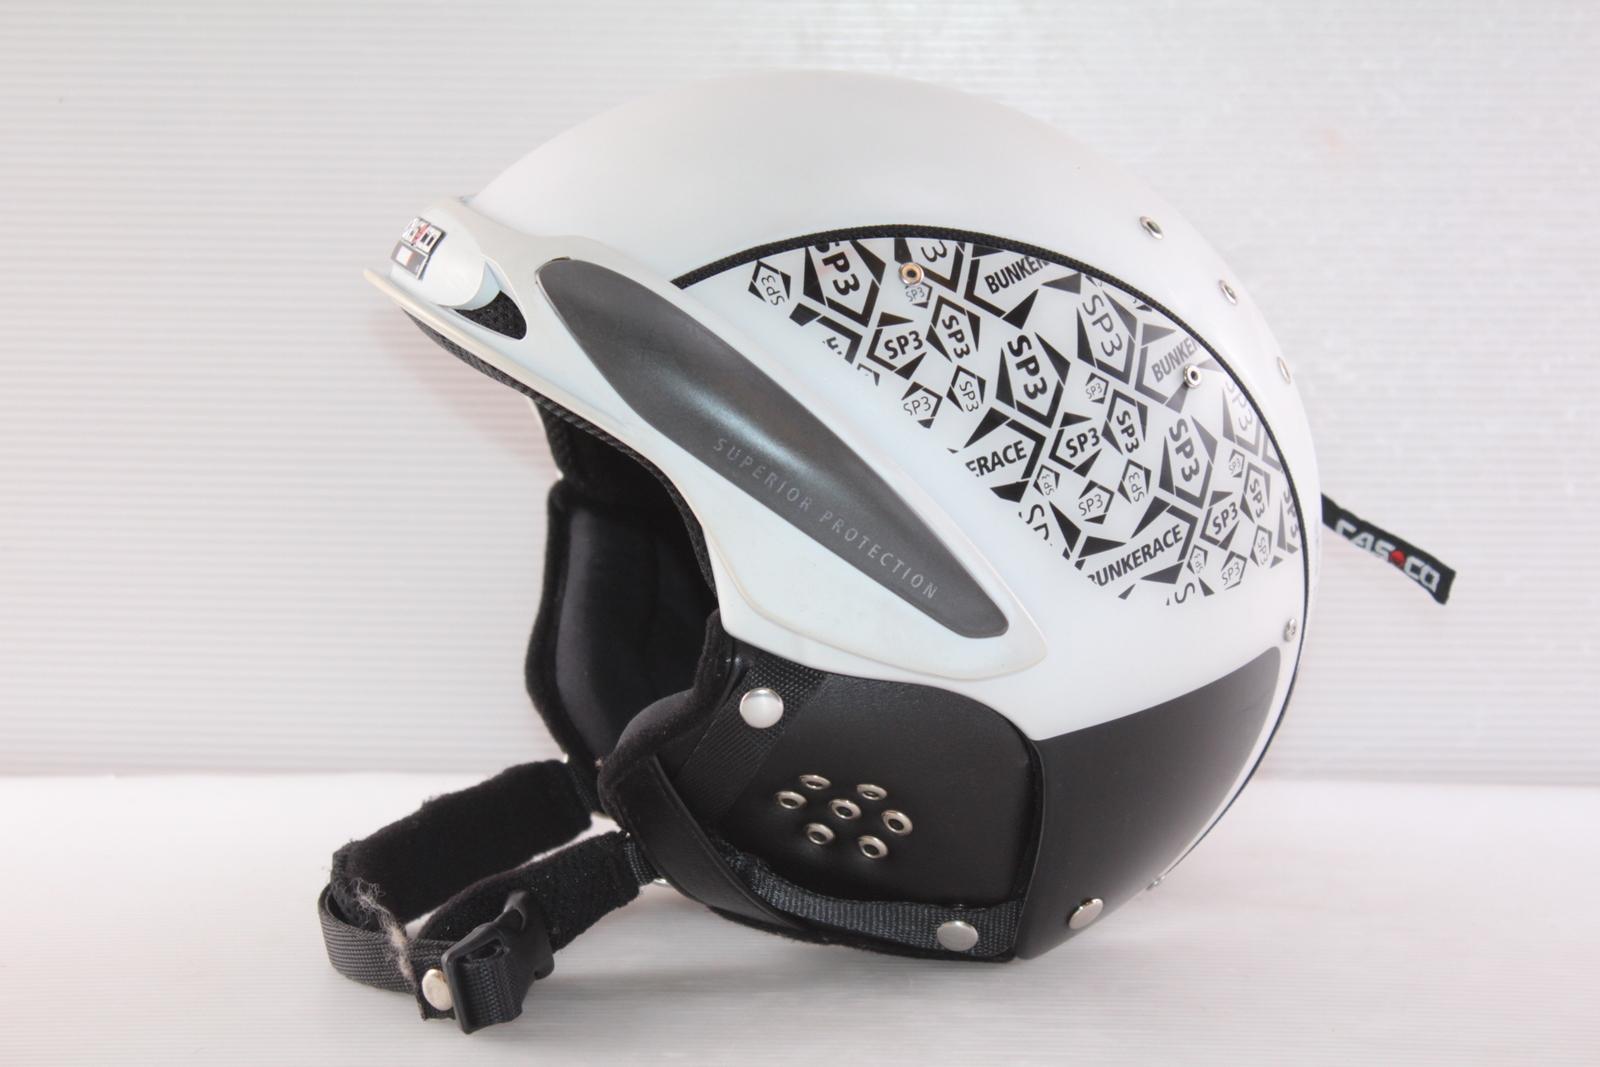 Dámská lyžařská helma Casco SP-3 - posuvná vel. 52 - 57